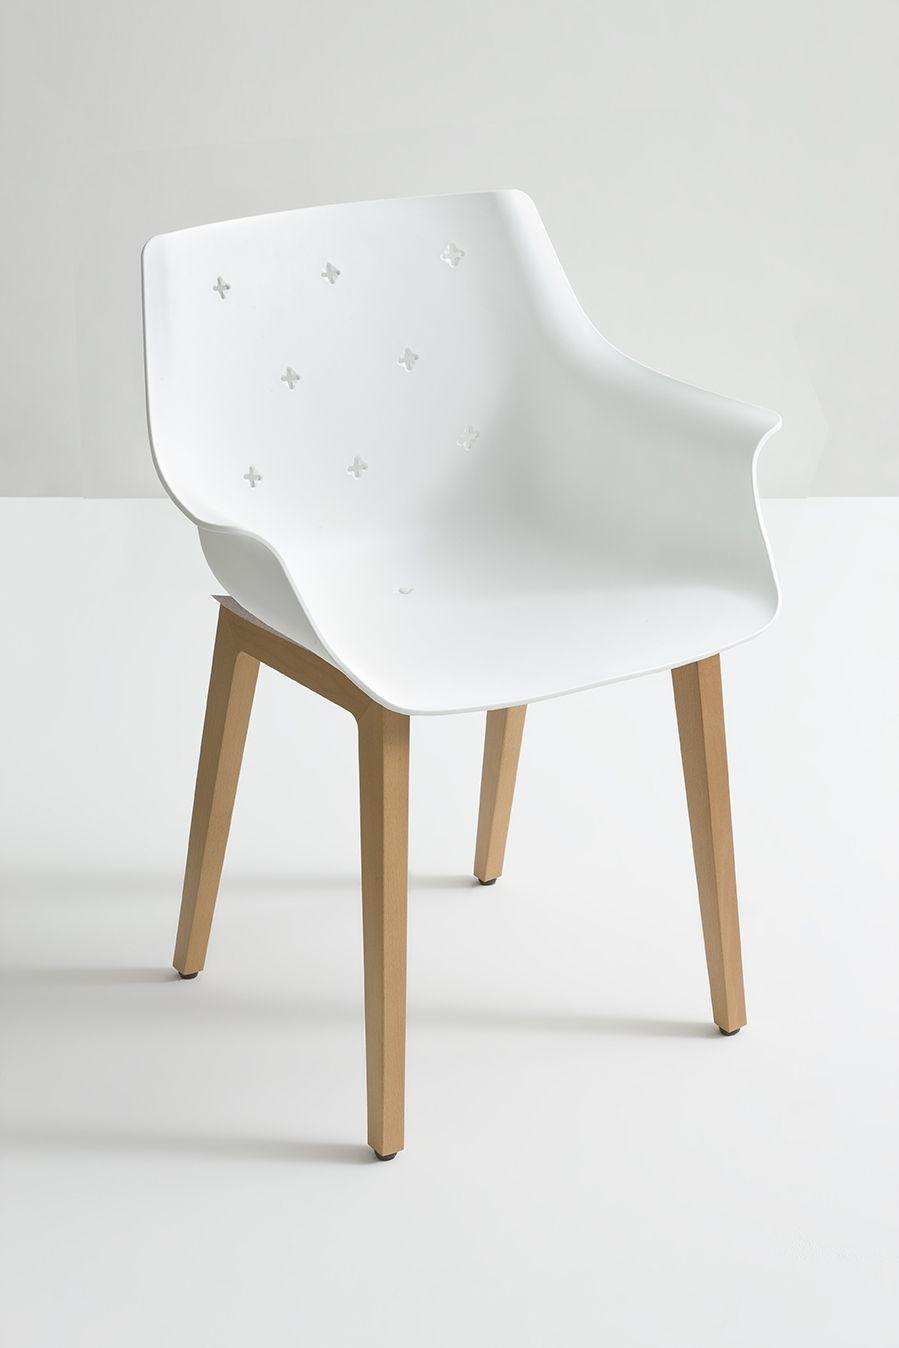 Fp Collection Less Wood Designer Stoel Meubel Ideeen Barkruk